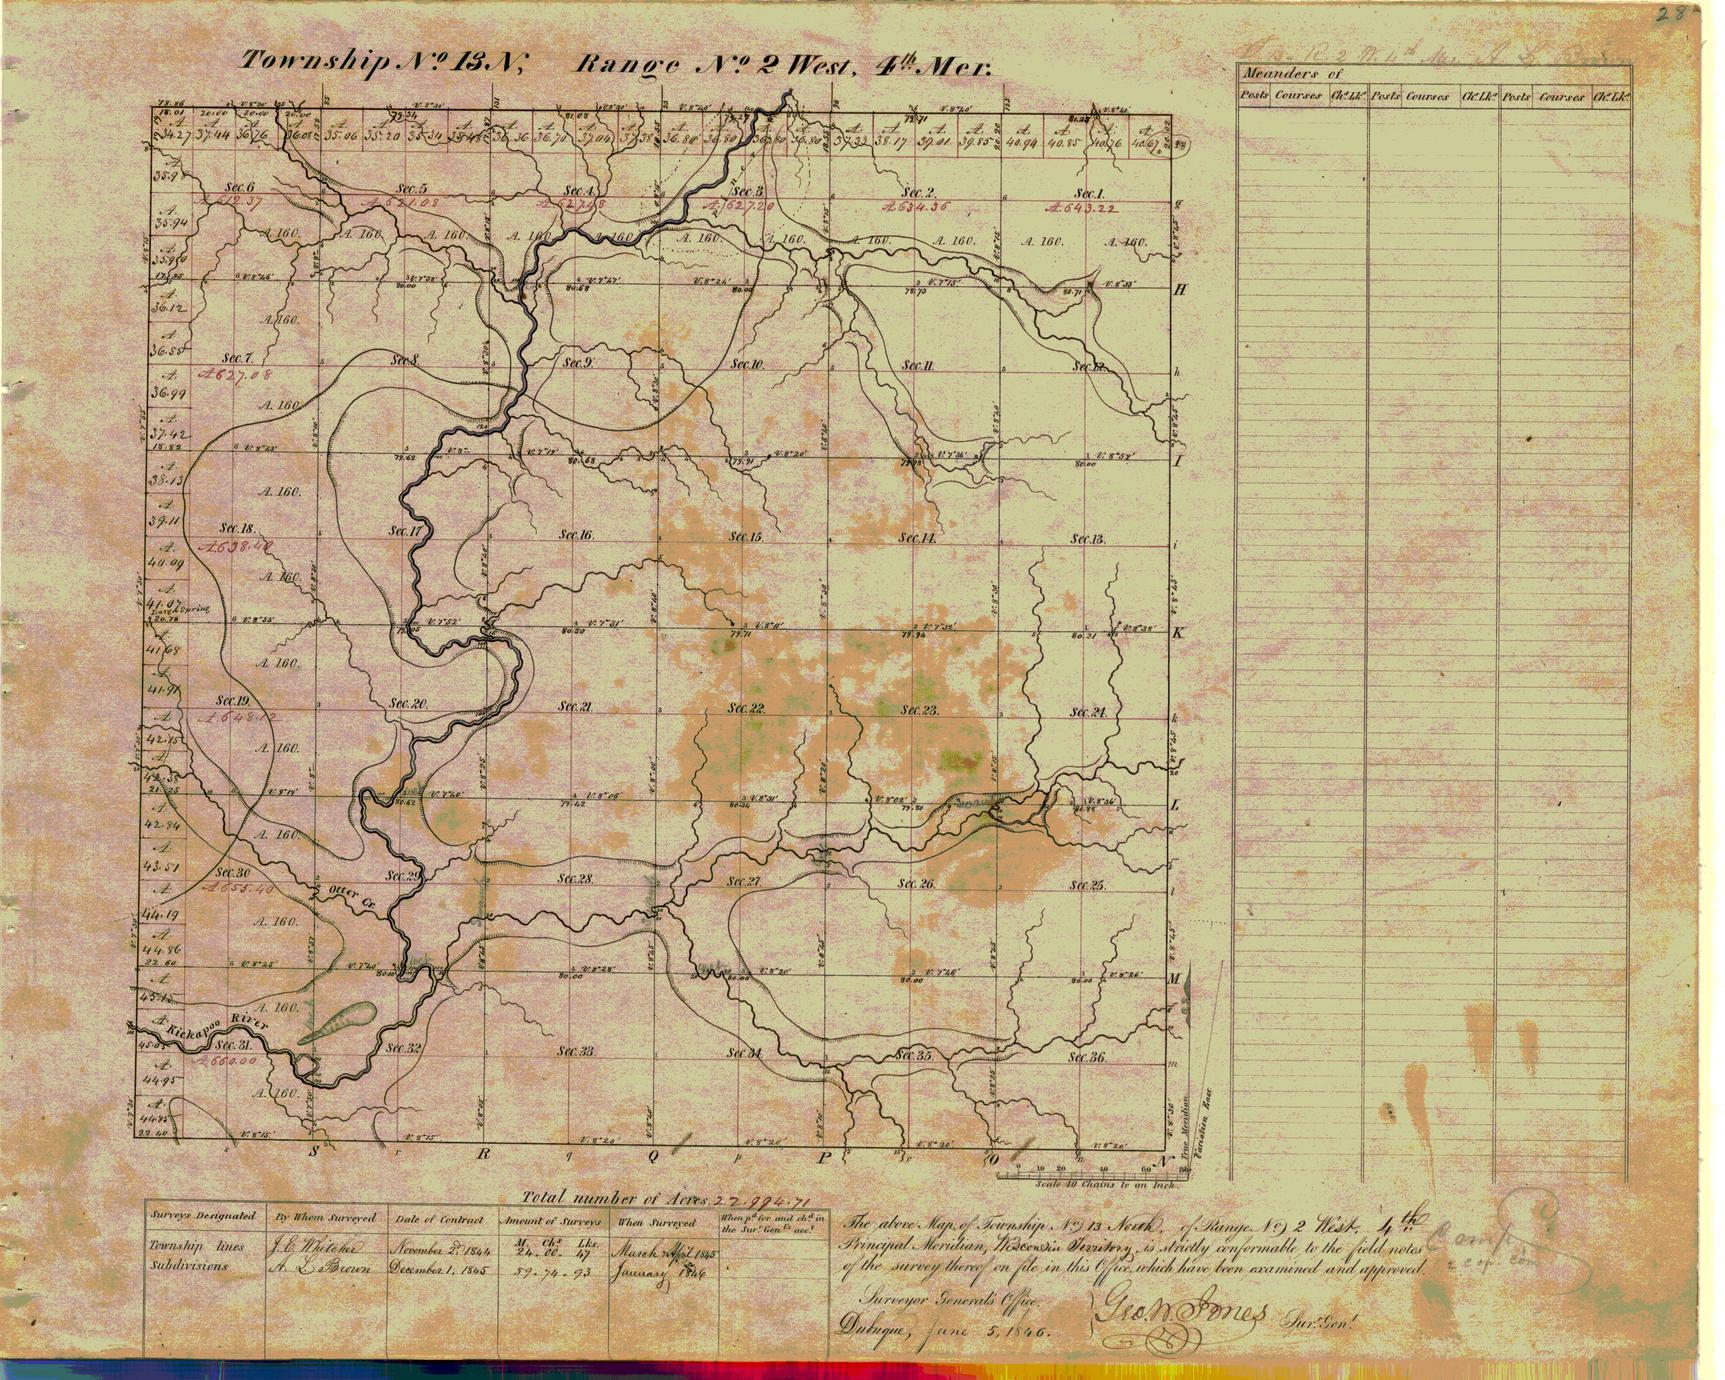 [Public Land Survey System map: Wisconsin Township 13 North, Range 02 West]